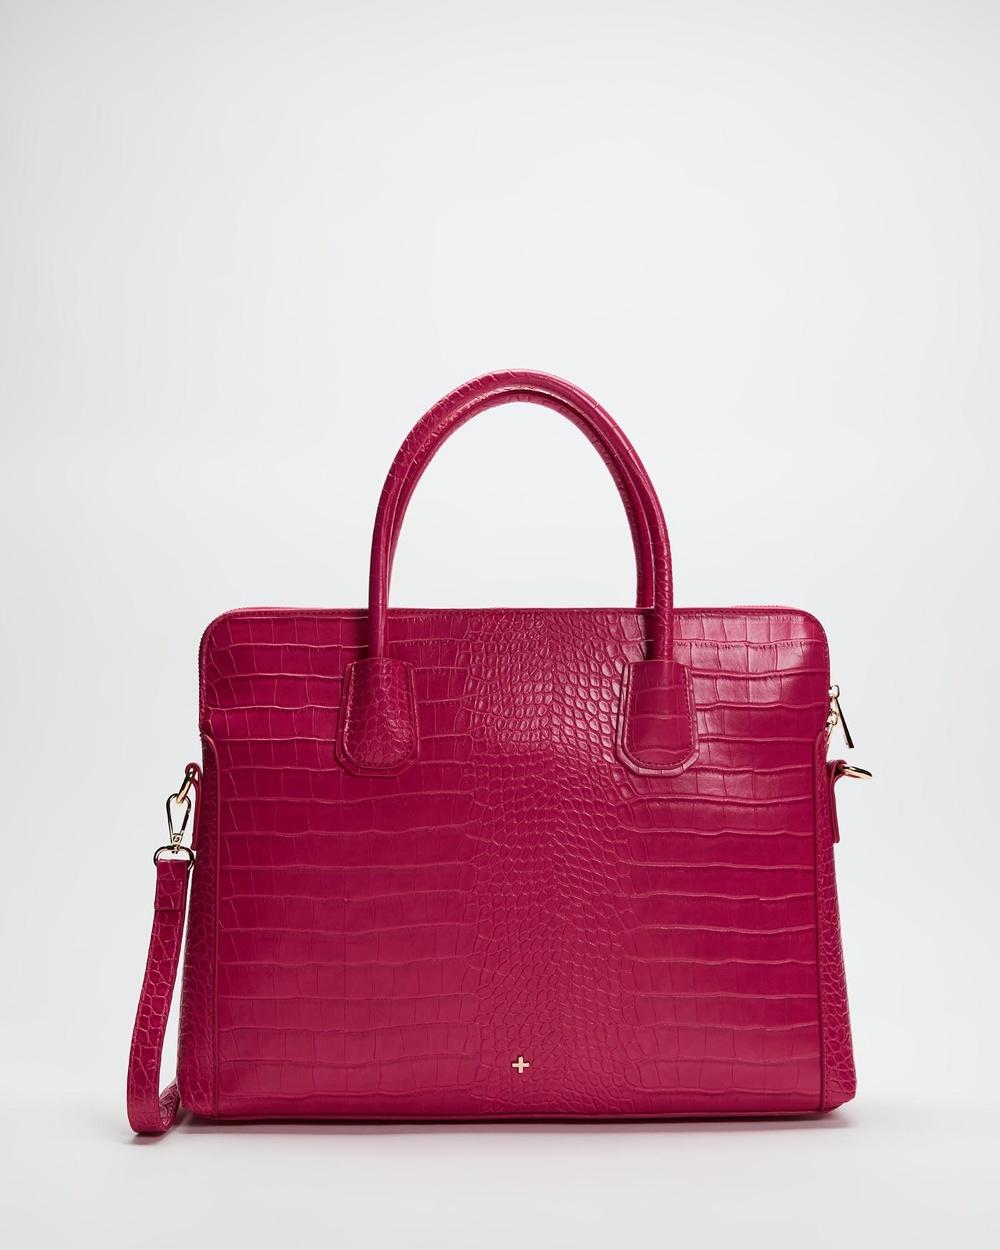 PETA AND JAIN Hustle Laptop Bag Handbags Fuchsia Croc